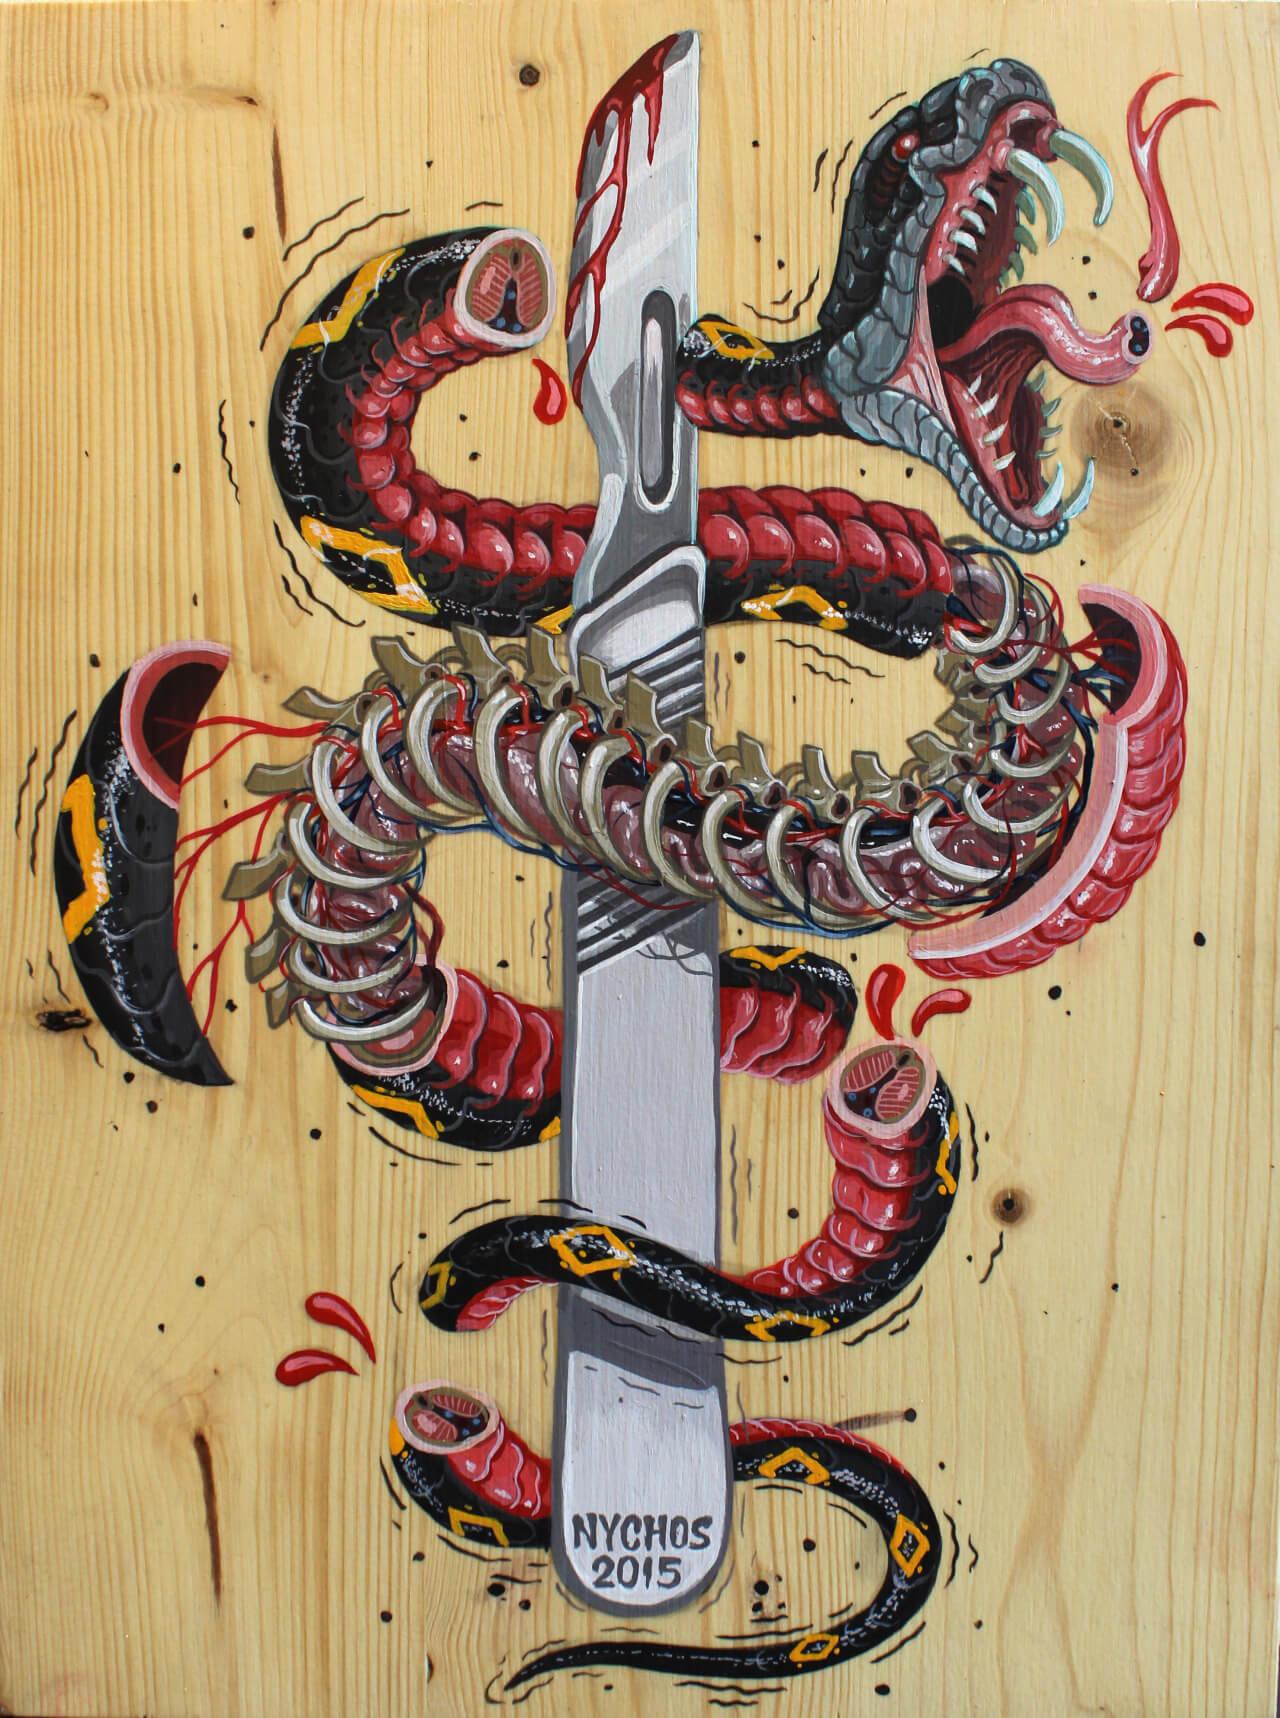 nychos street art illustration 4